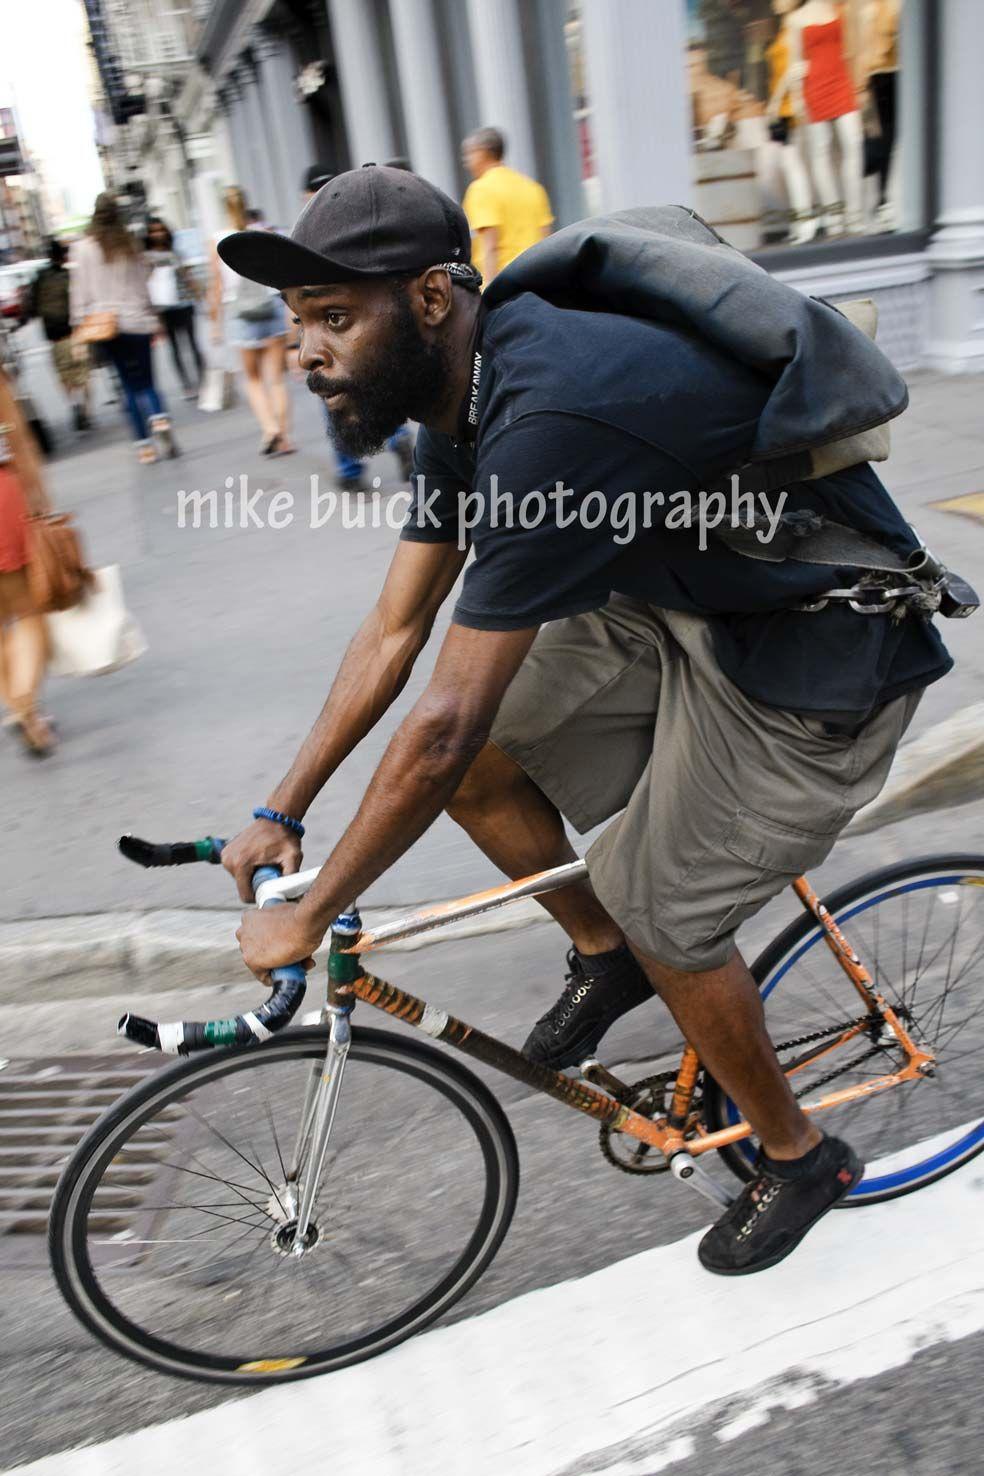 sydney bike messenger - photo#1